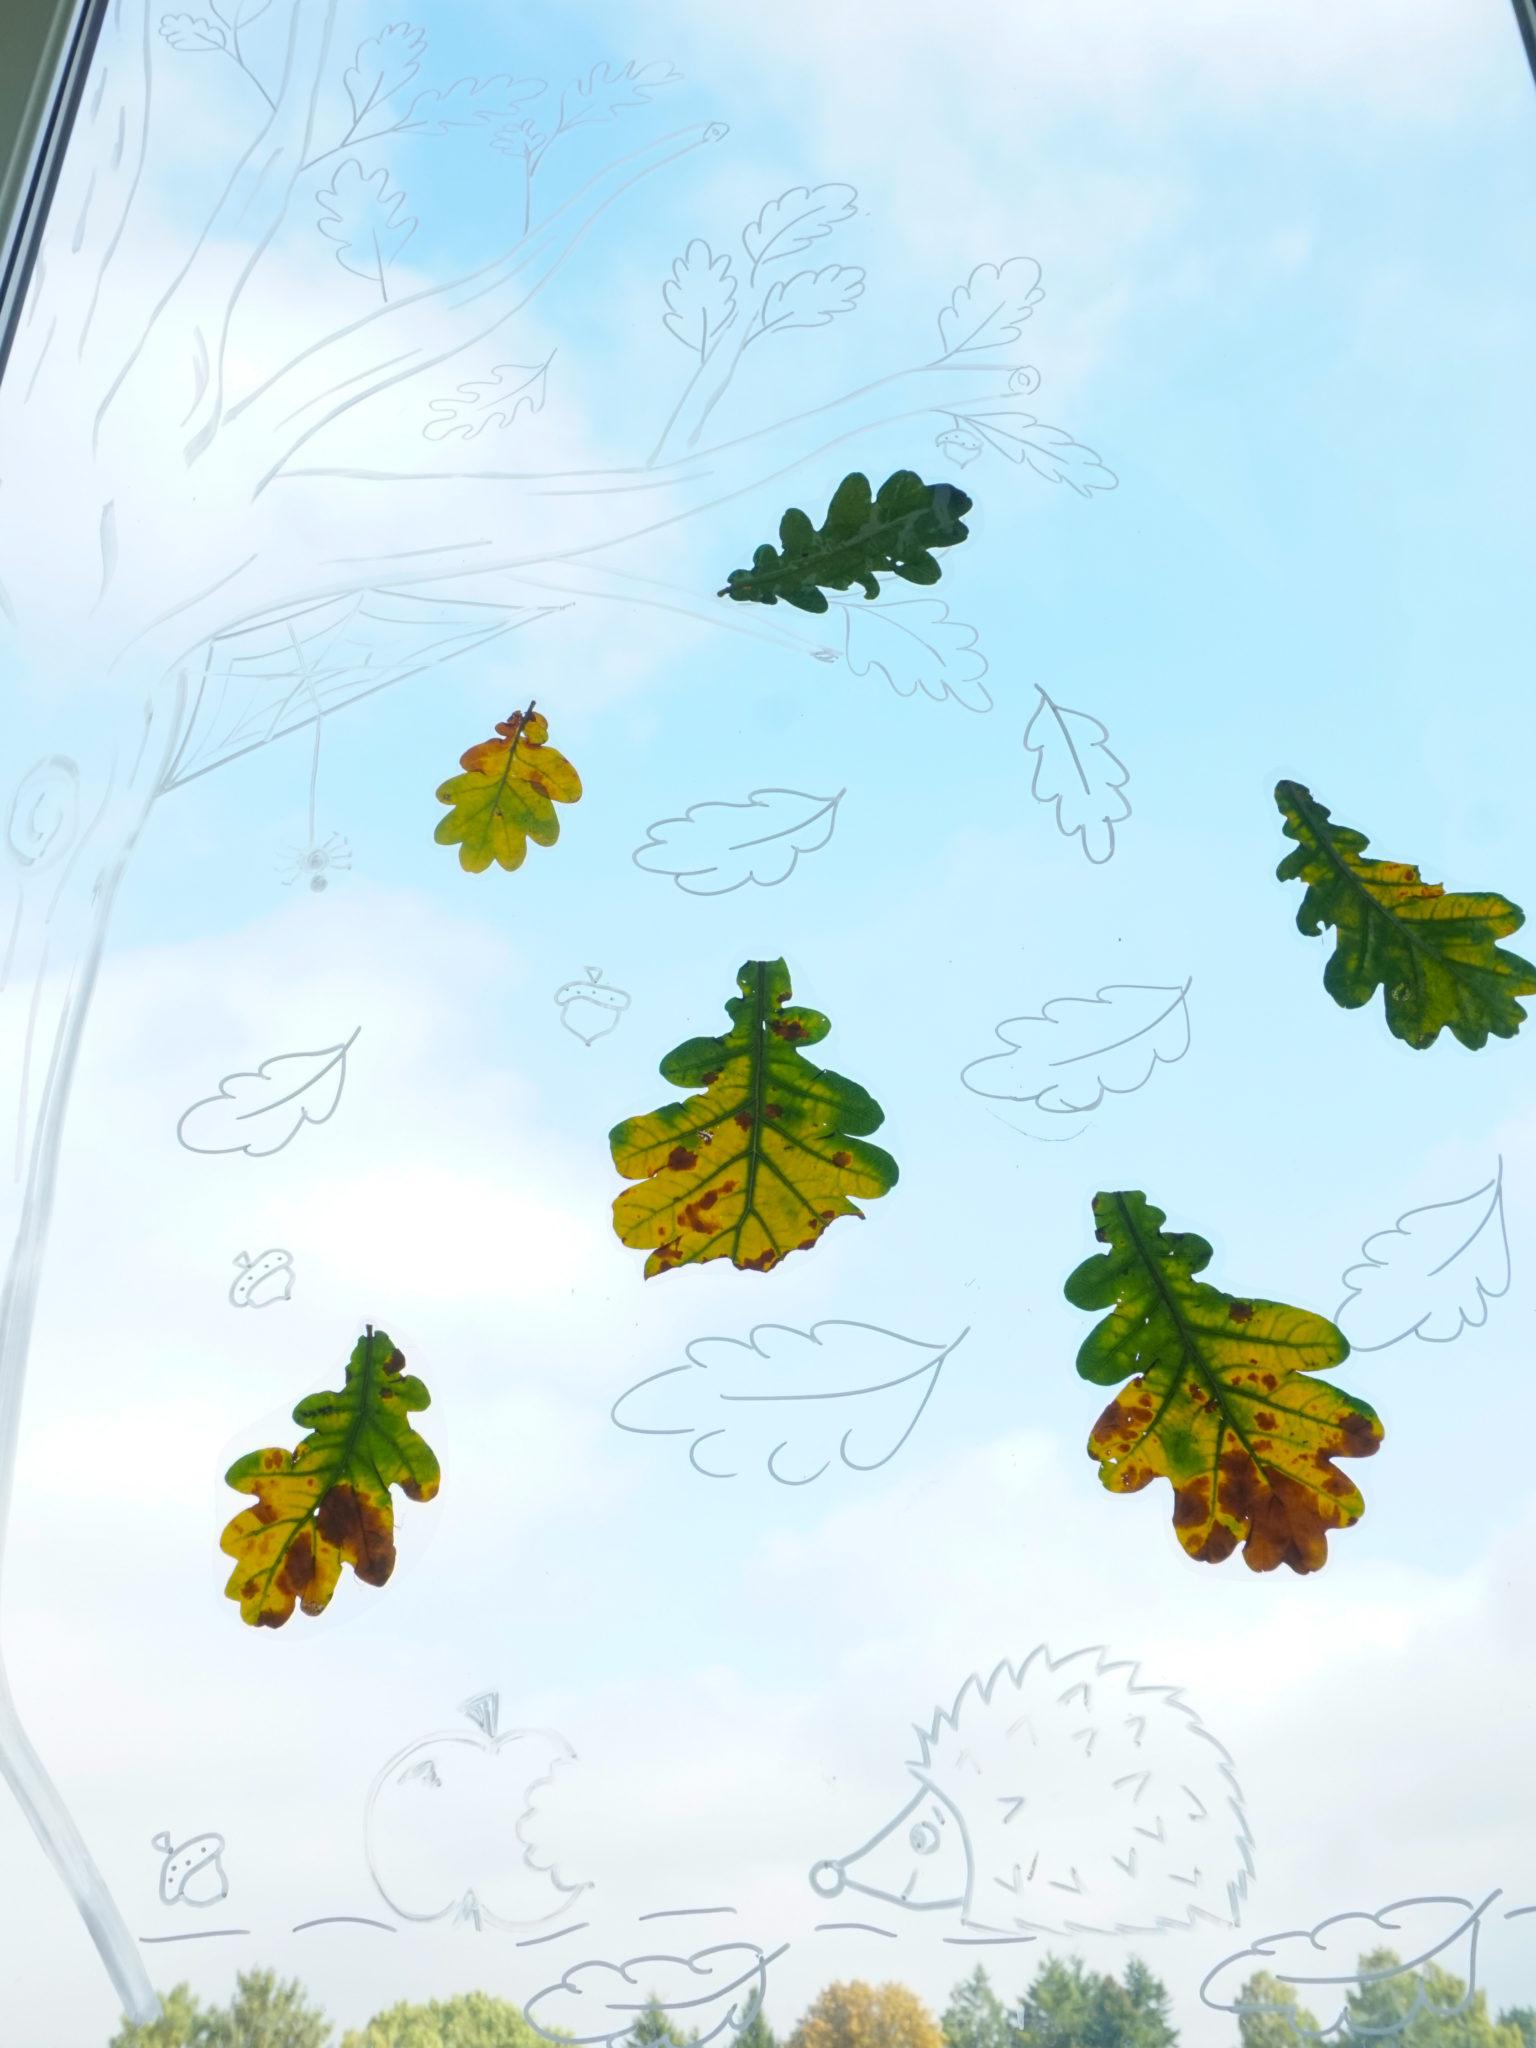 Herbst fensterbilder deko hus - Herbst fensterbilder ...